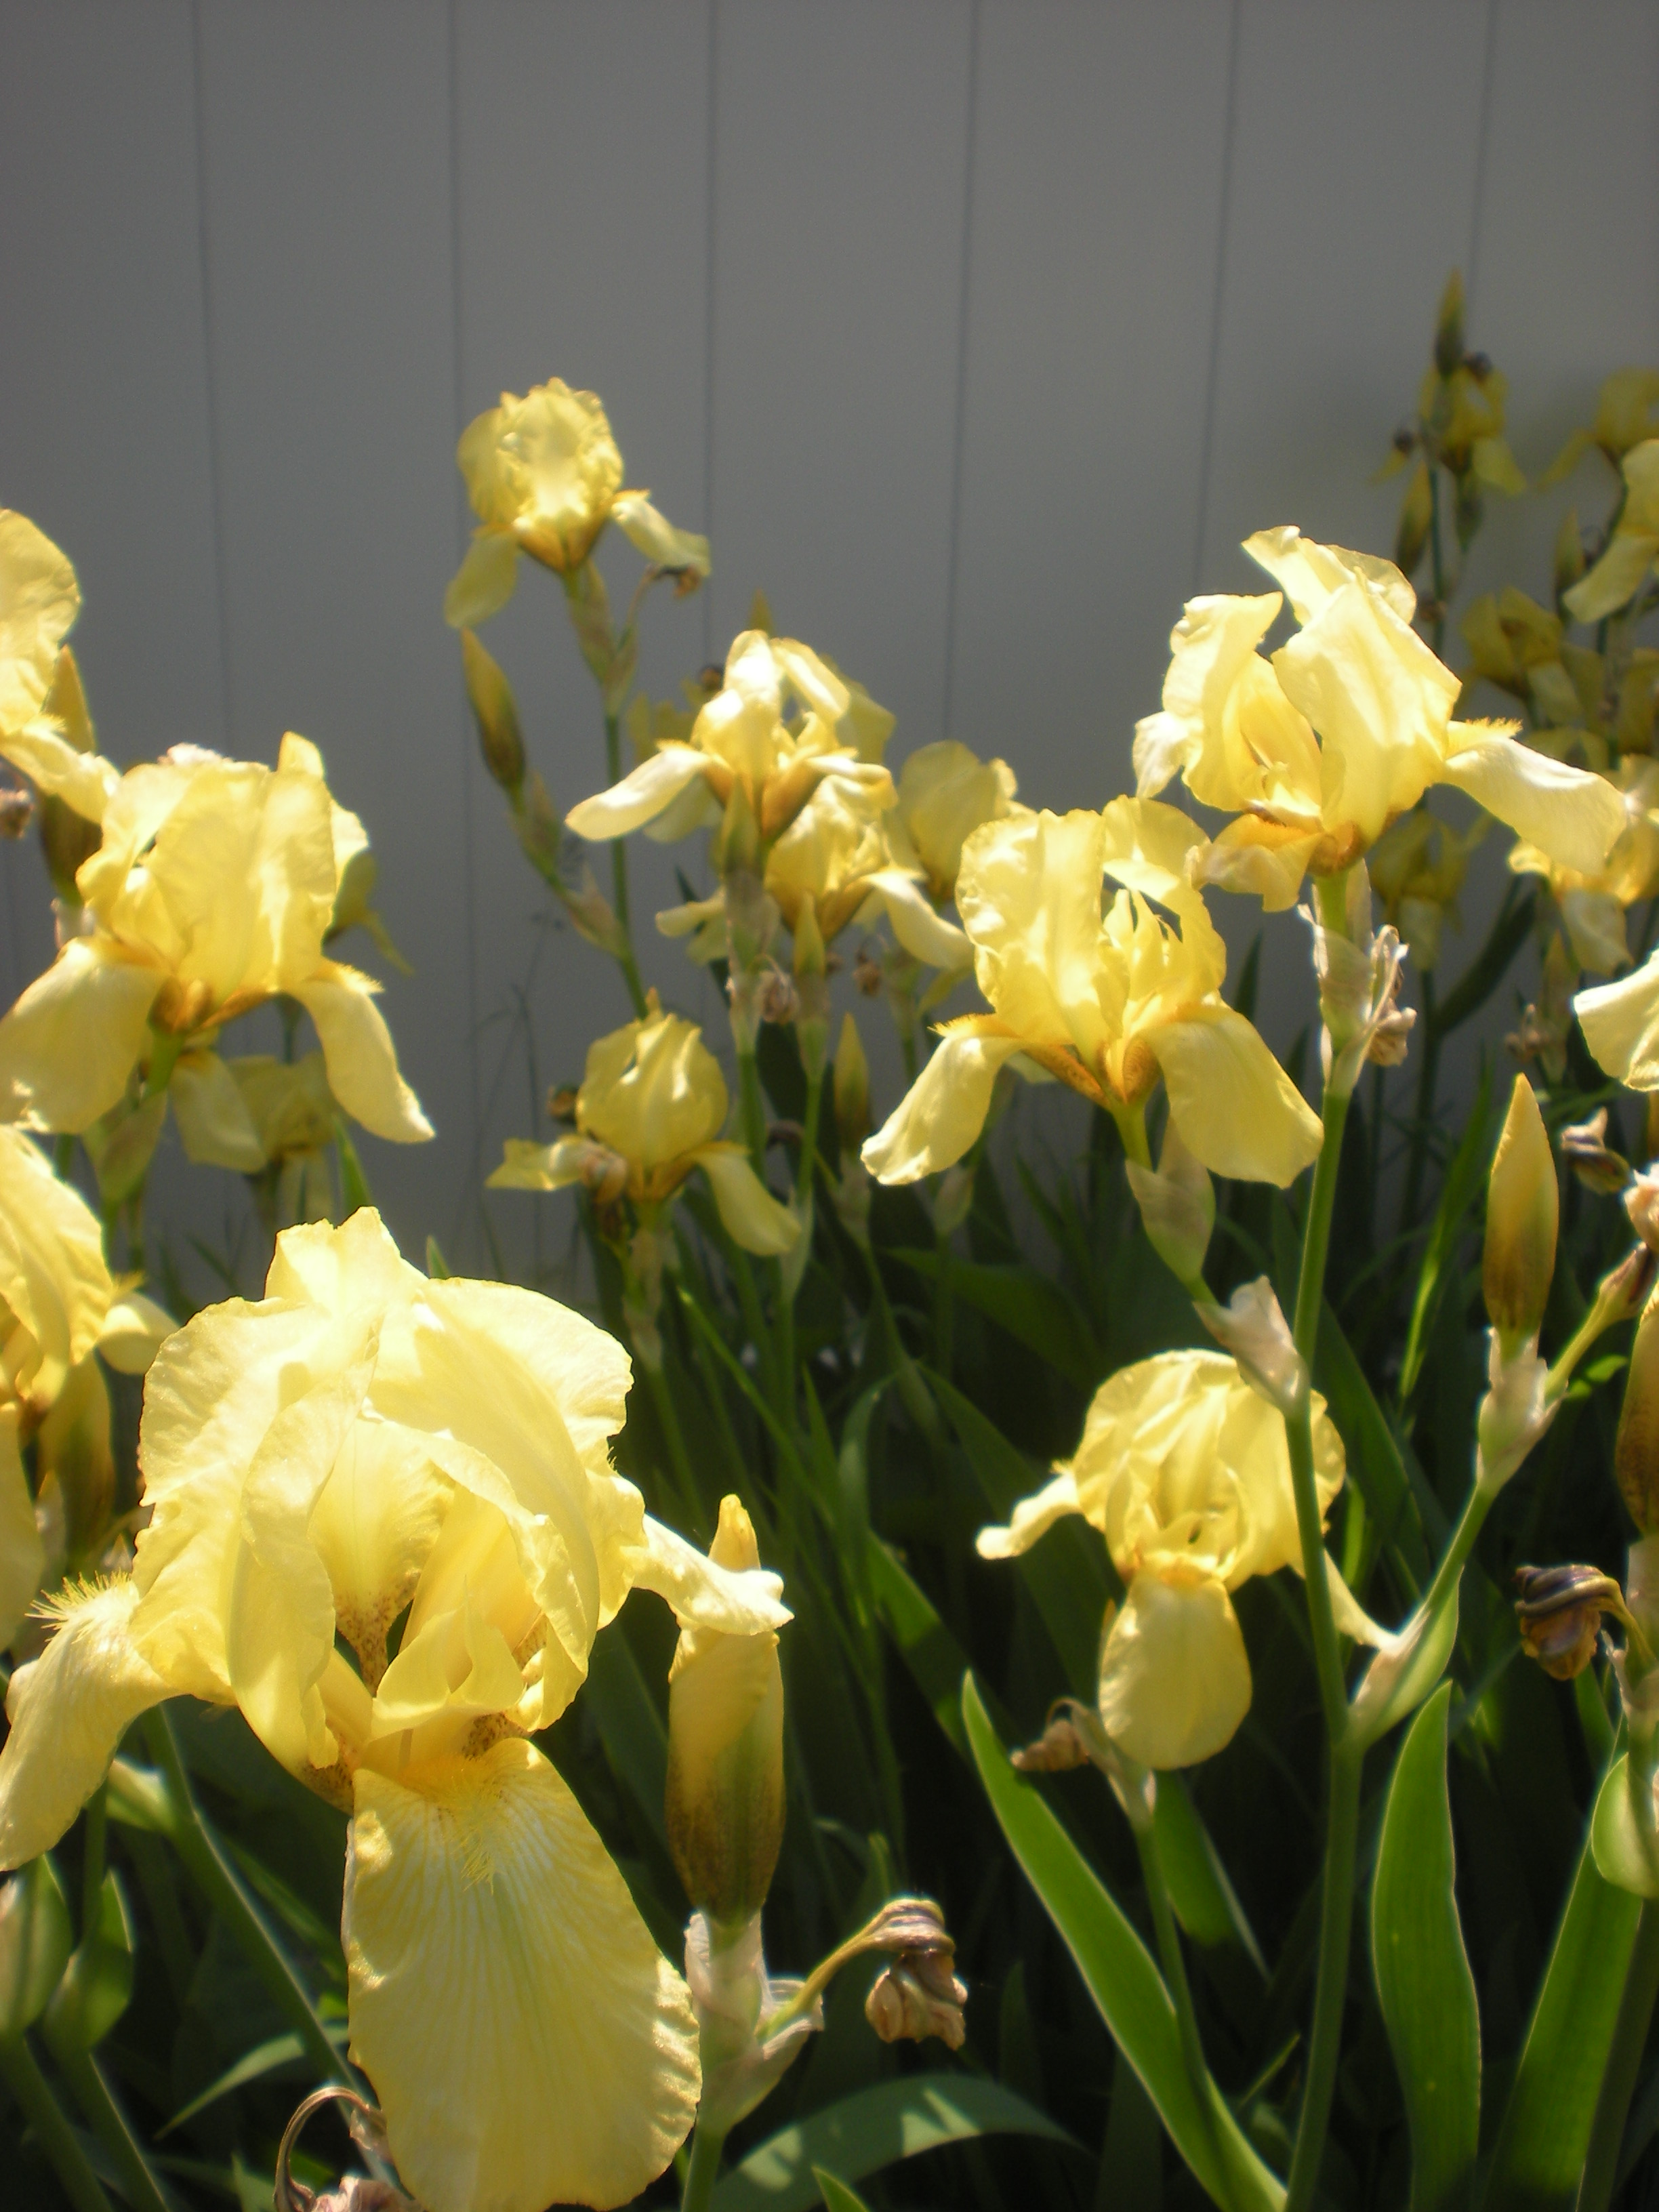 LOOKING GOOD Sun-kissed irises brighten the yard and my spirits.